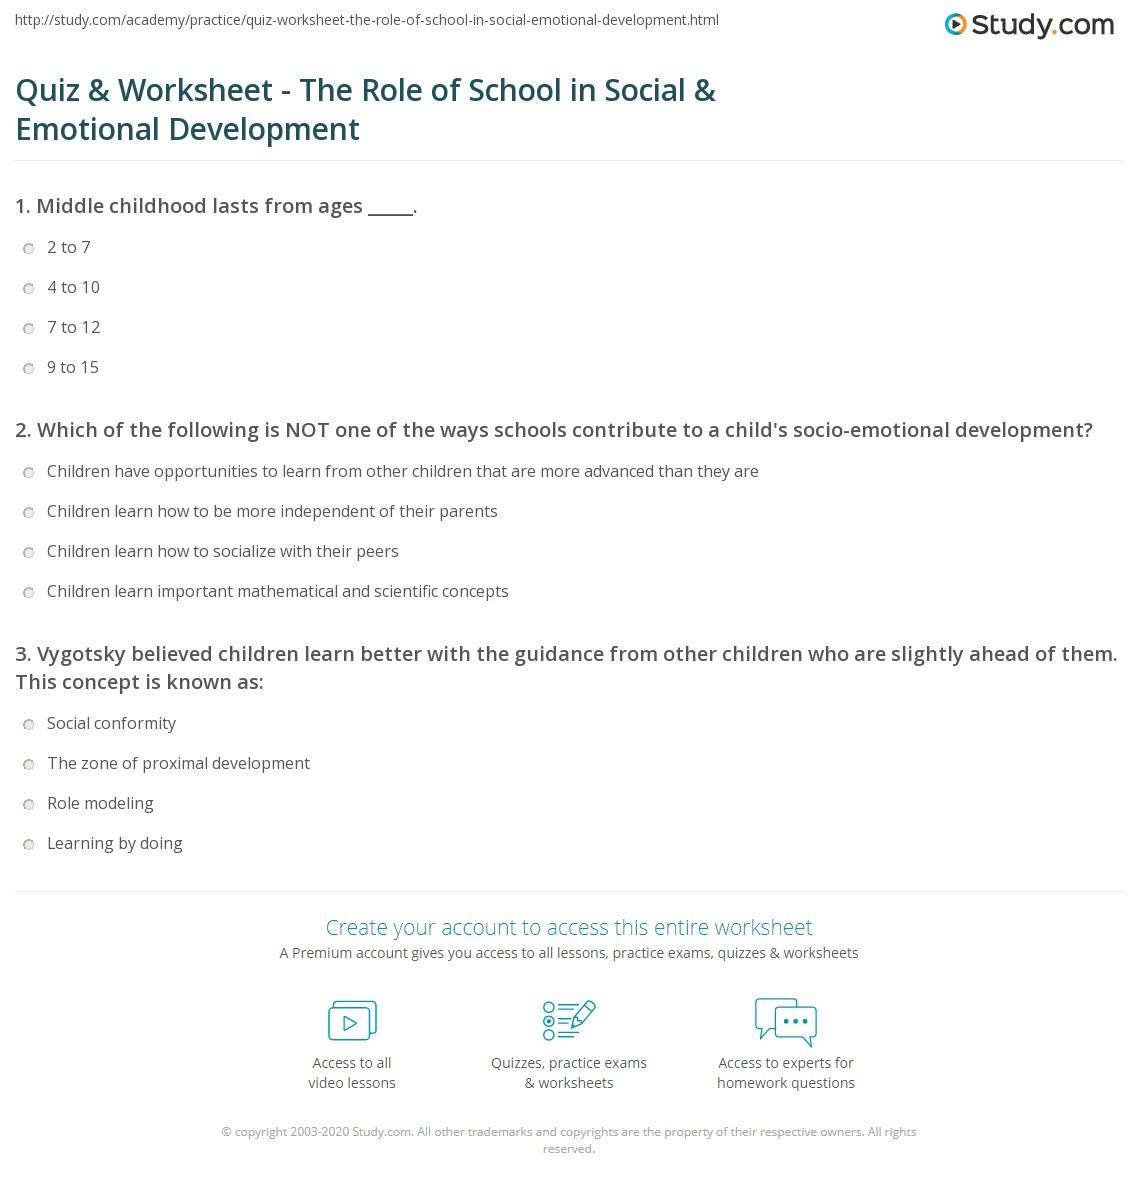 quiz & worksheet - the role of school in social & emotional